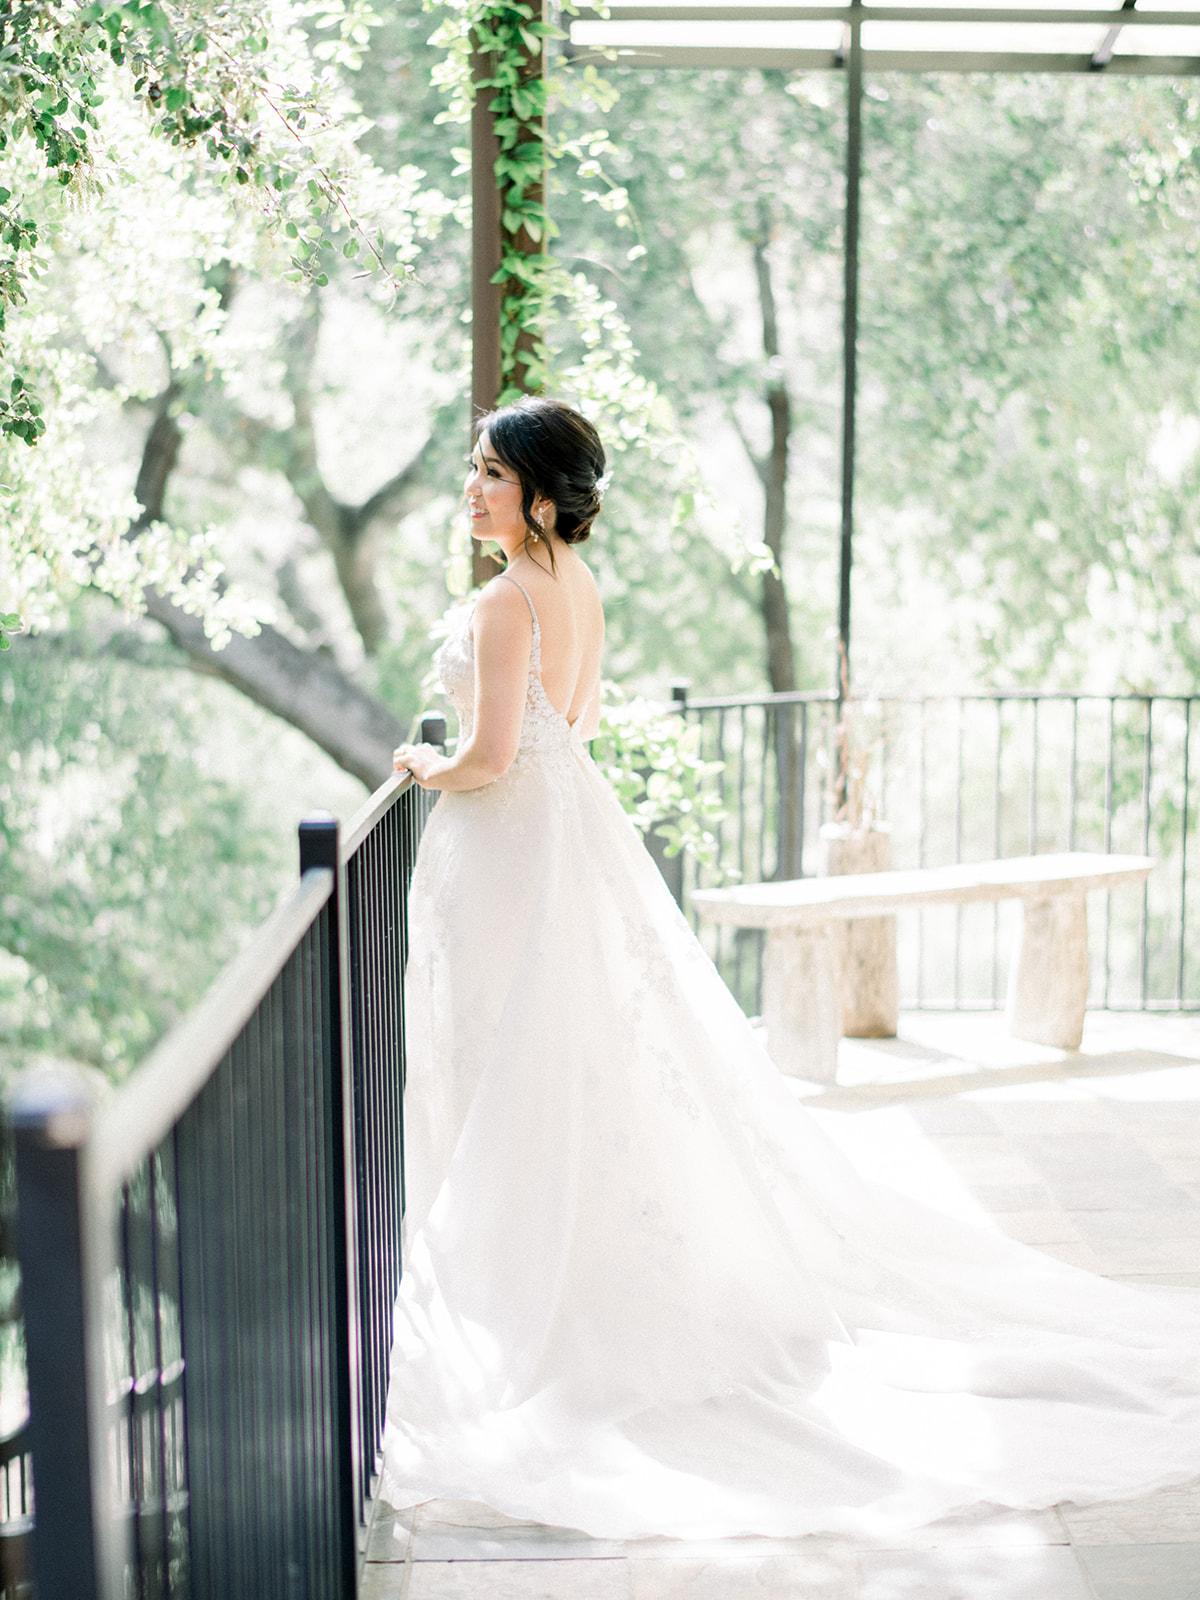 jueunandjon-etherandsmith-wedding-256.jpg